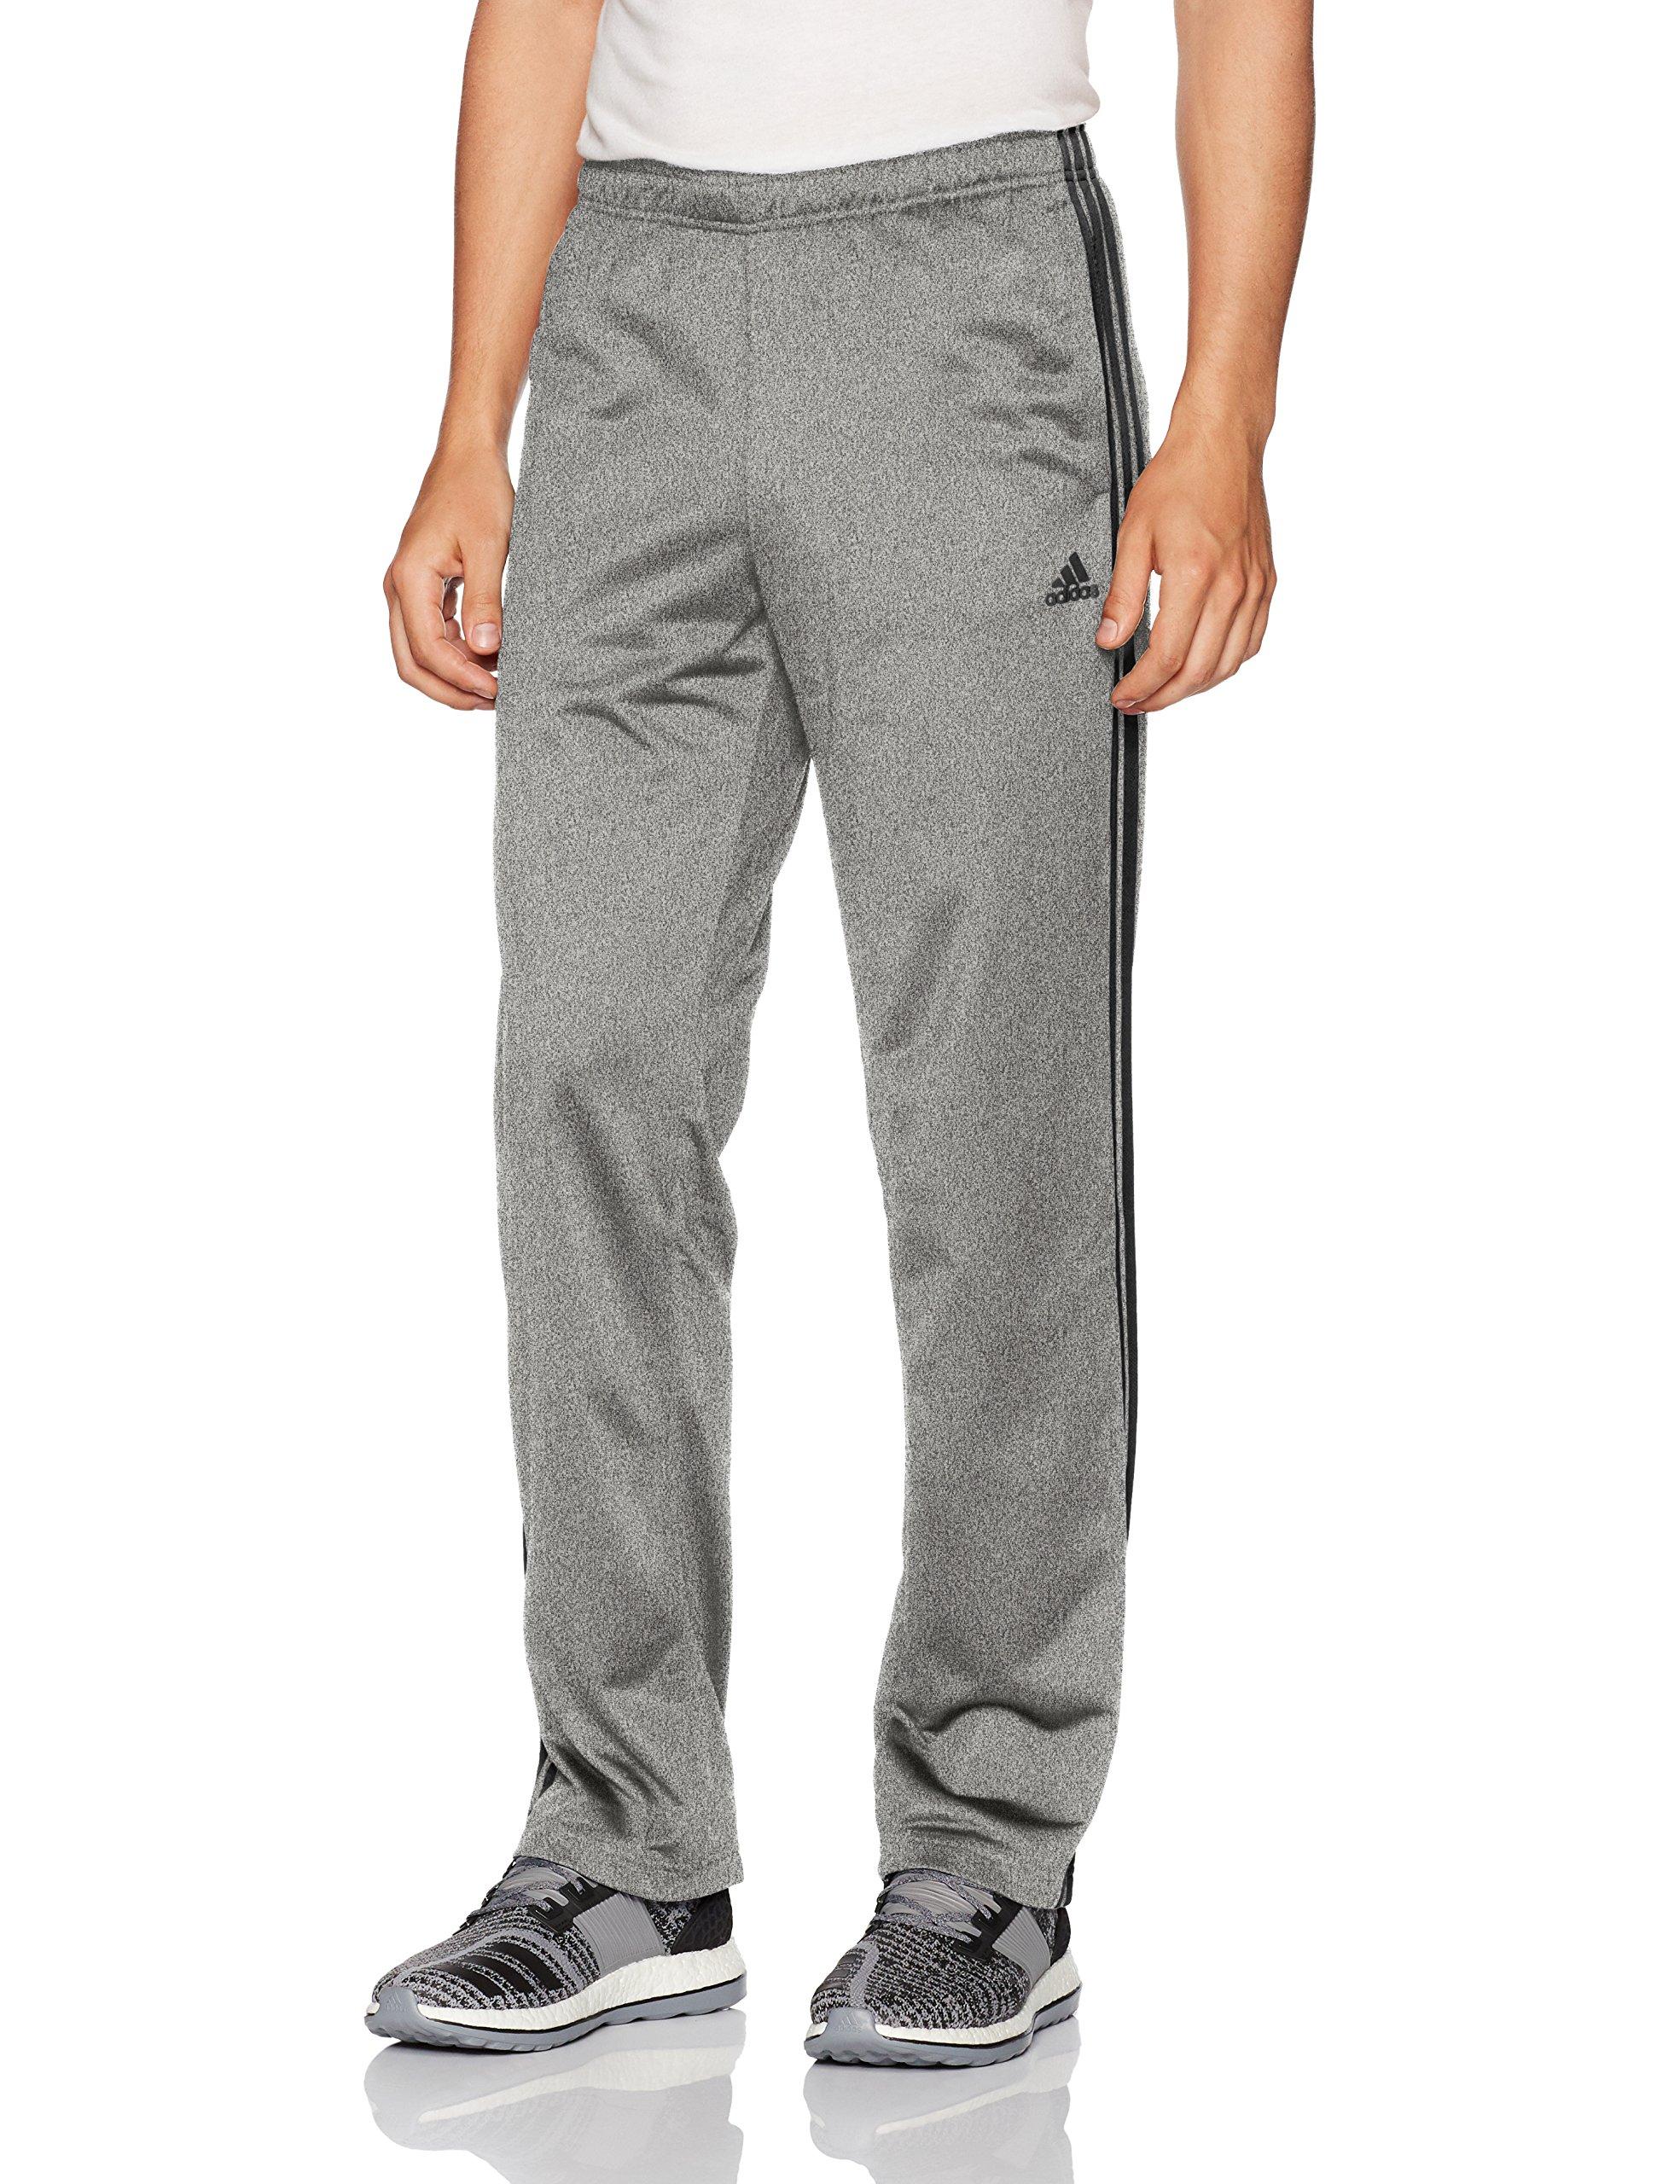 adidas Men's Athletics Essential Tricot 3-Stripe Pants, Dark Grey/Black, X-Small